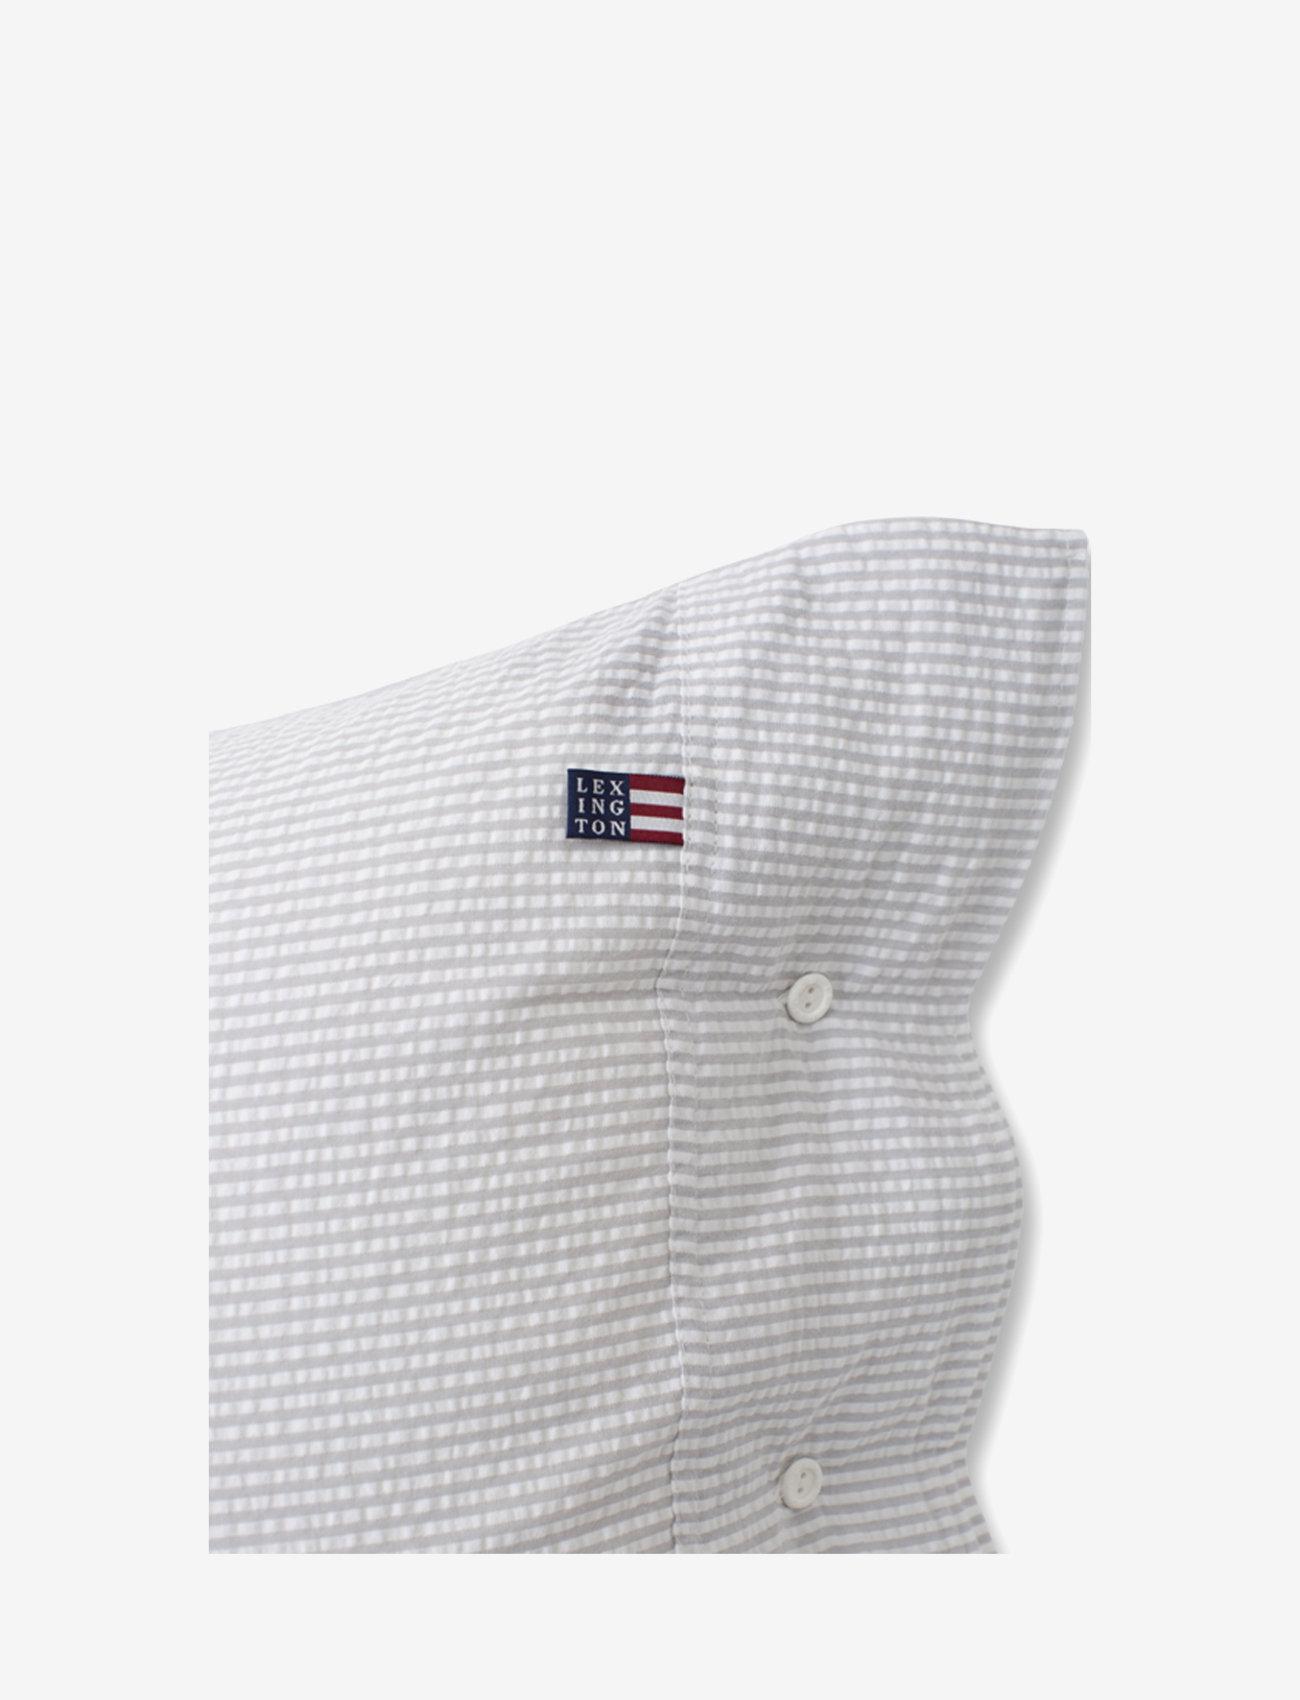 Lexington Home - Lt Gray/White Striped Cotton Seersucker Pillowcase - taie d'oreiller - lt gray/white - 1